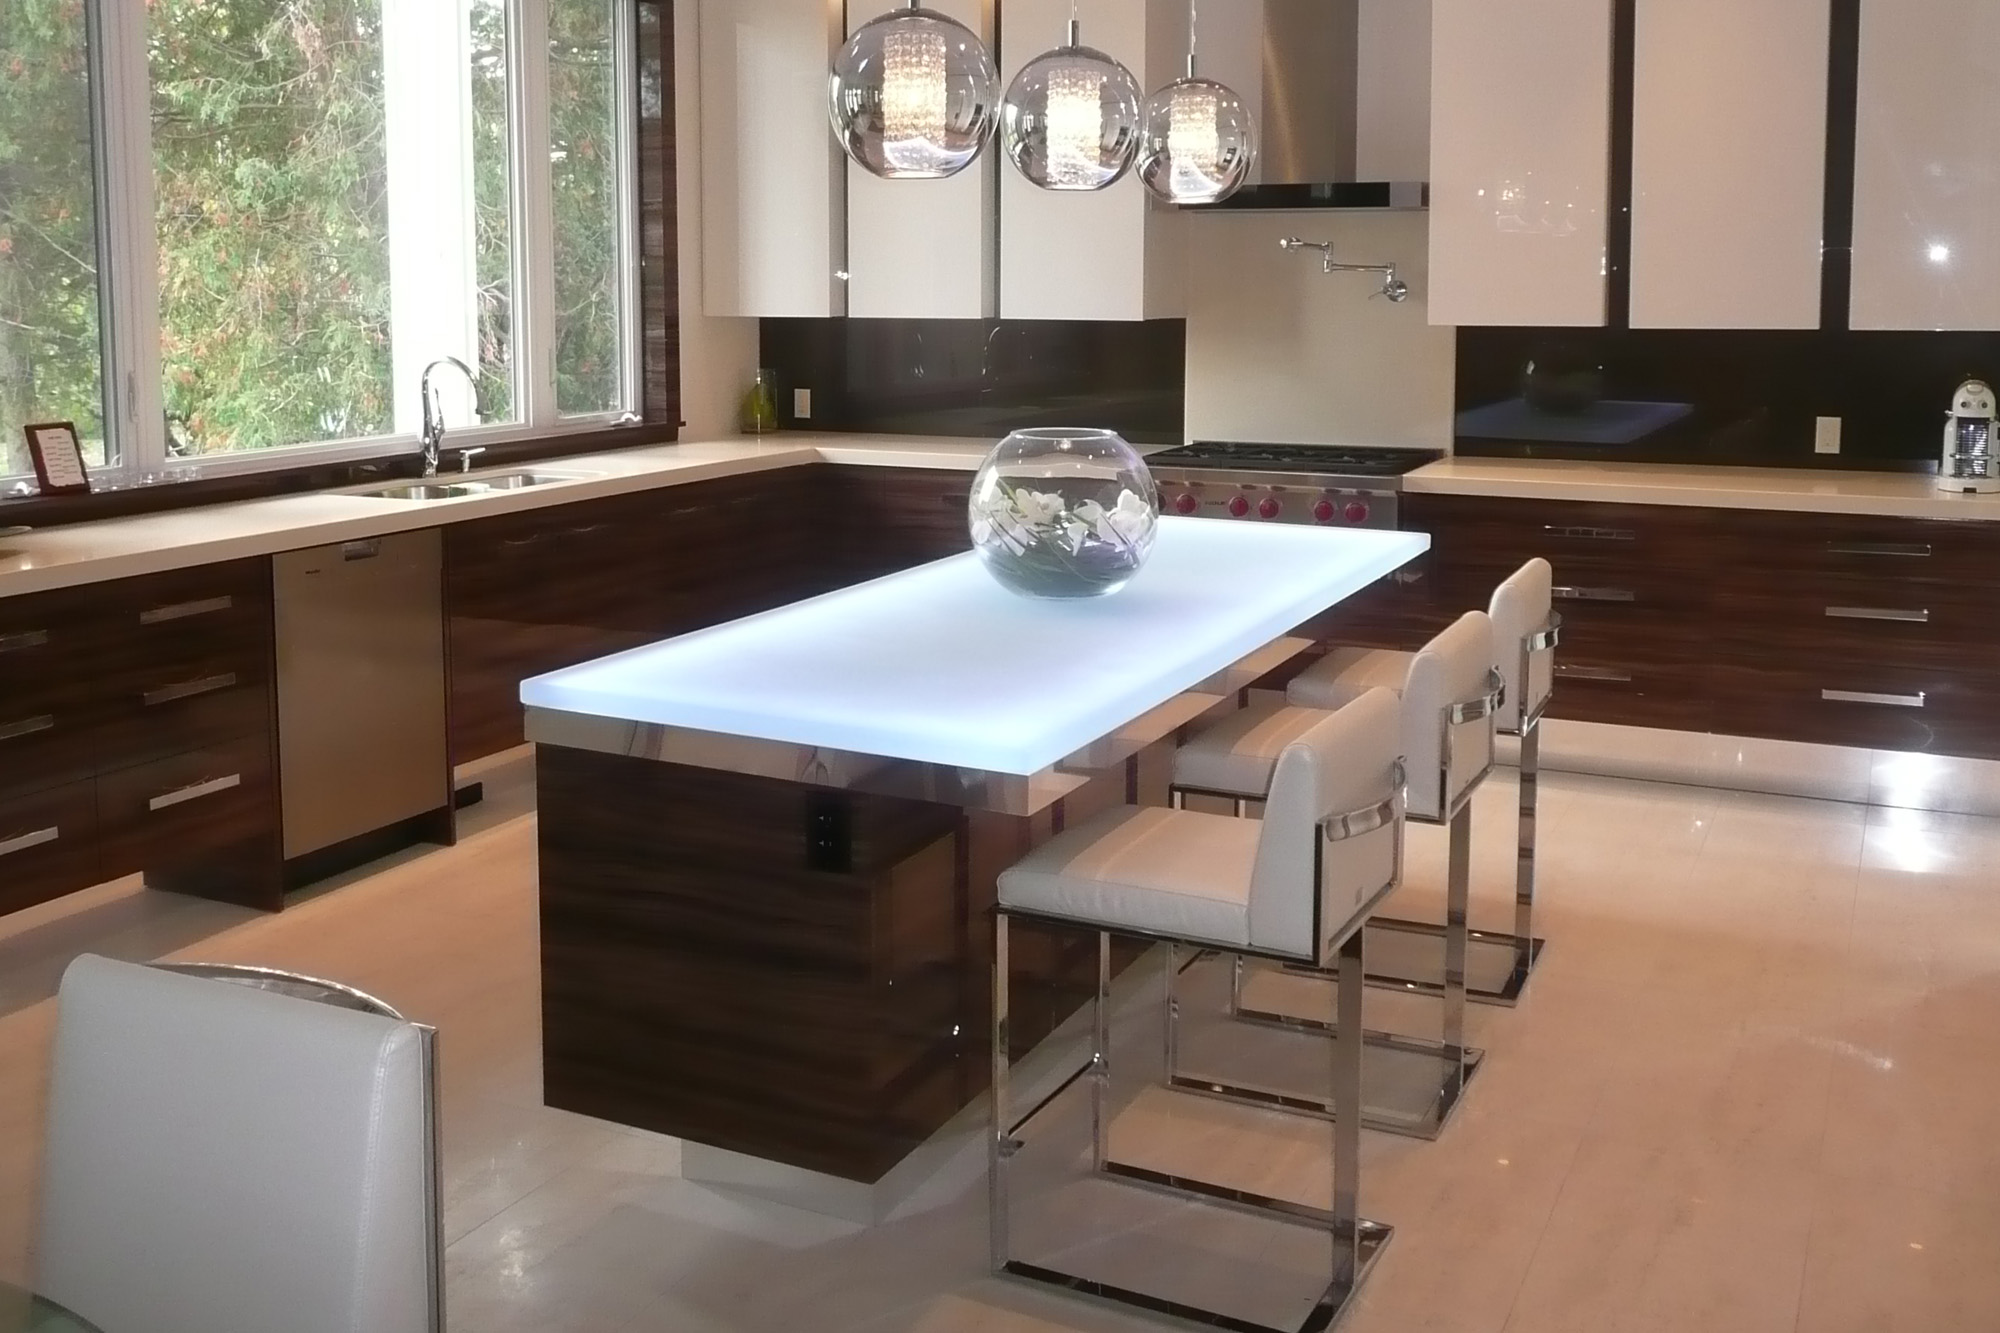 6 popular glass countertop types kitchen island countertop Glass Kitchen Island Countertop kitchenisland3